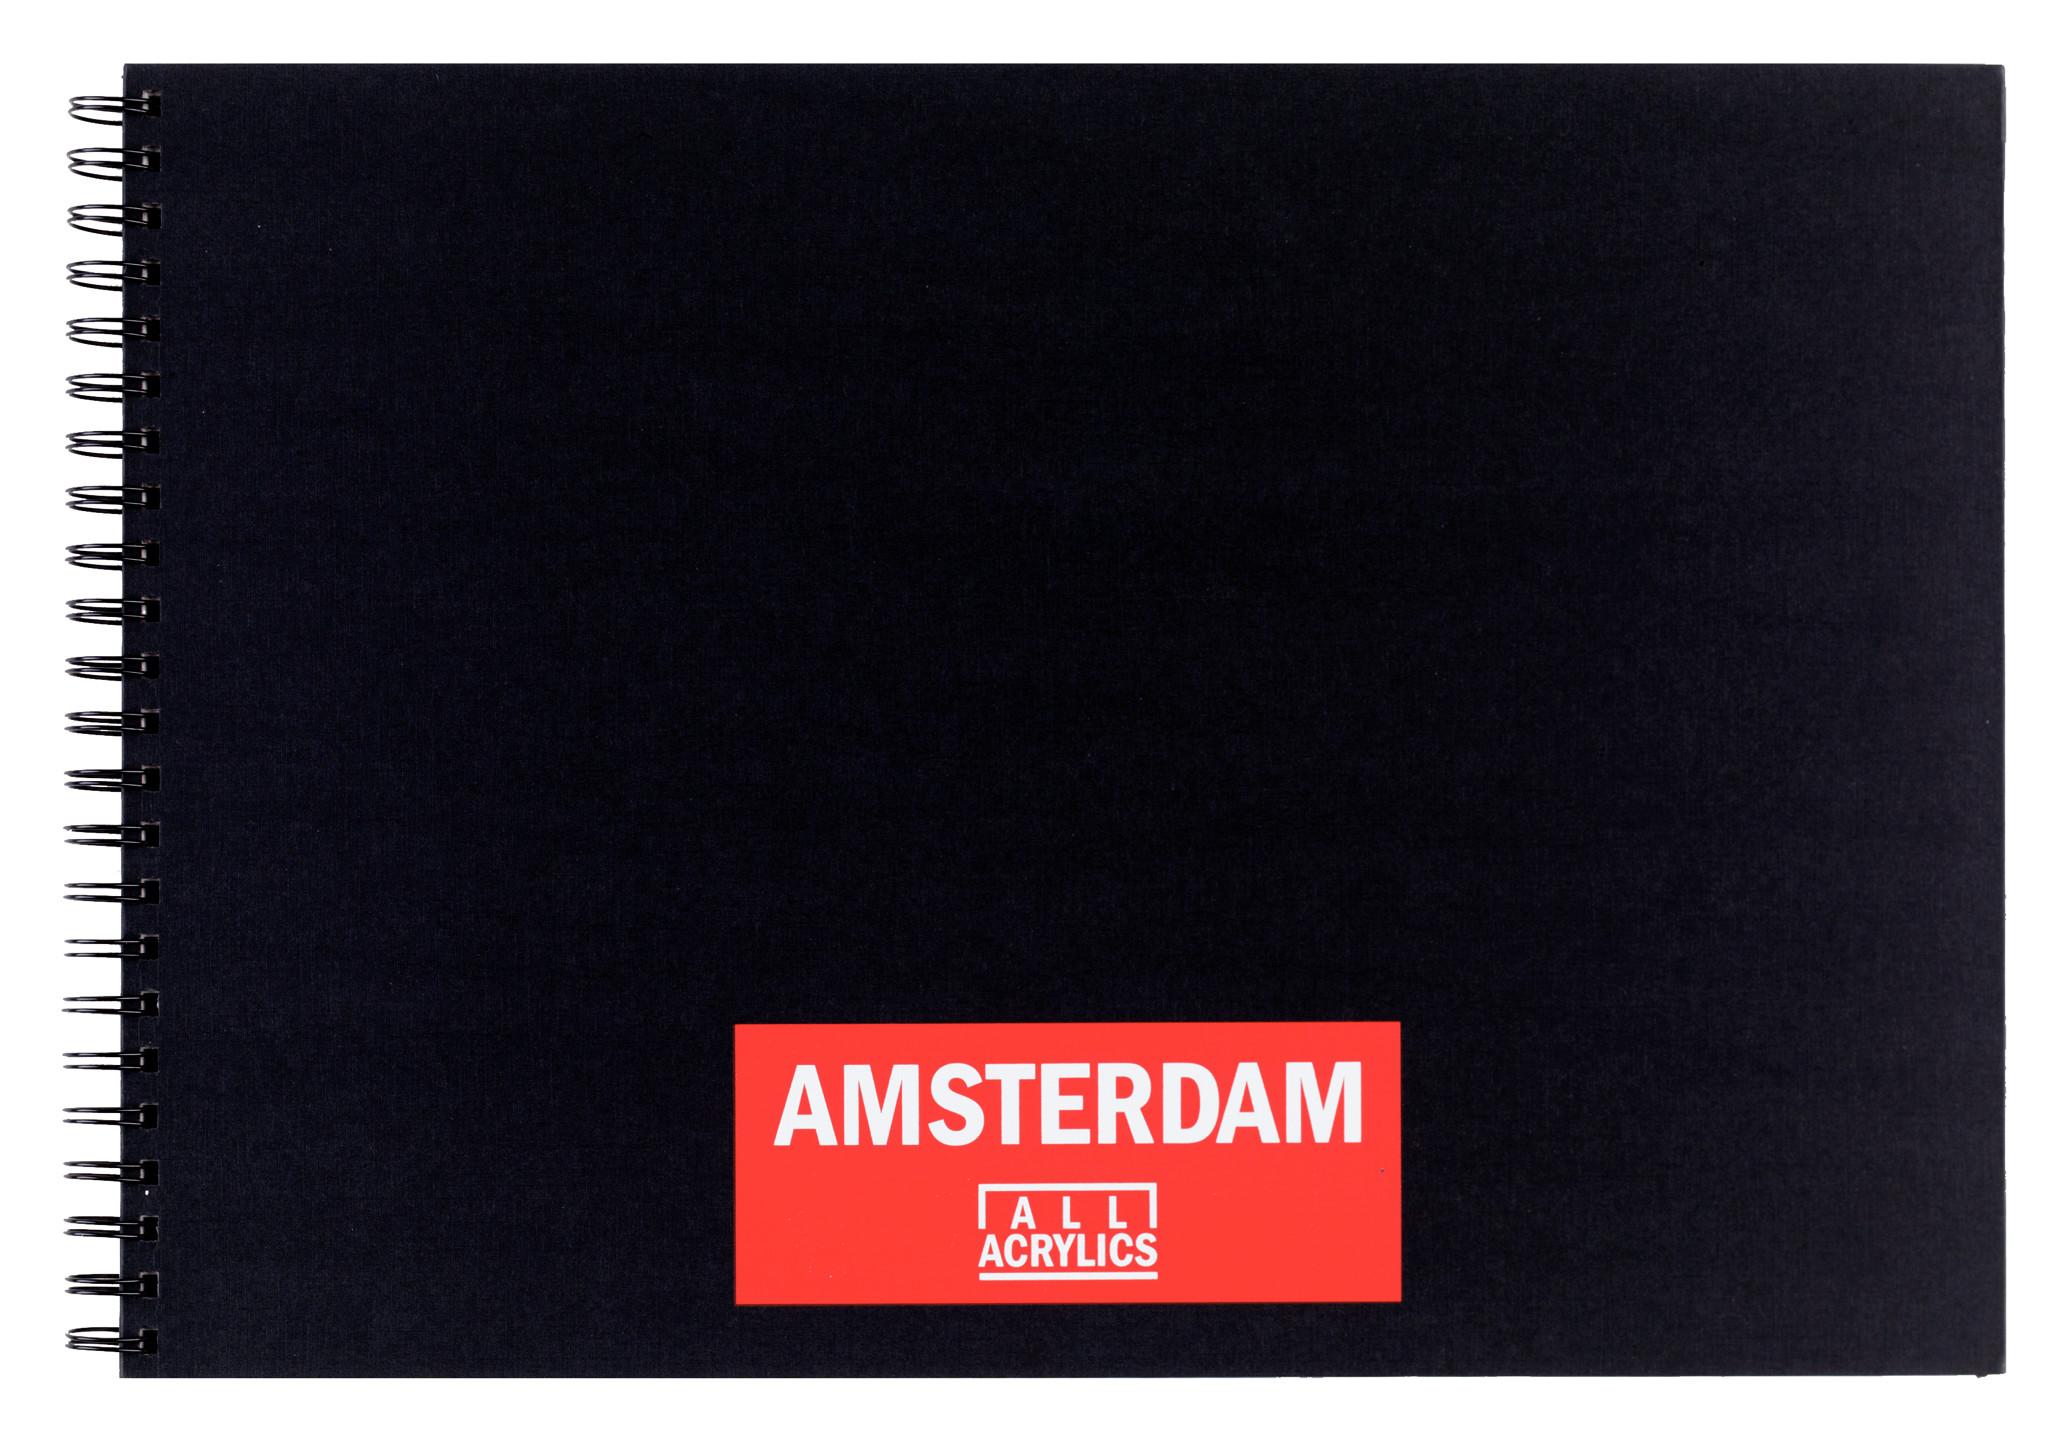 Amsterdam Black Book A3 -  42 x 29.7 cm - 250 g/m? -  30 Sheets